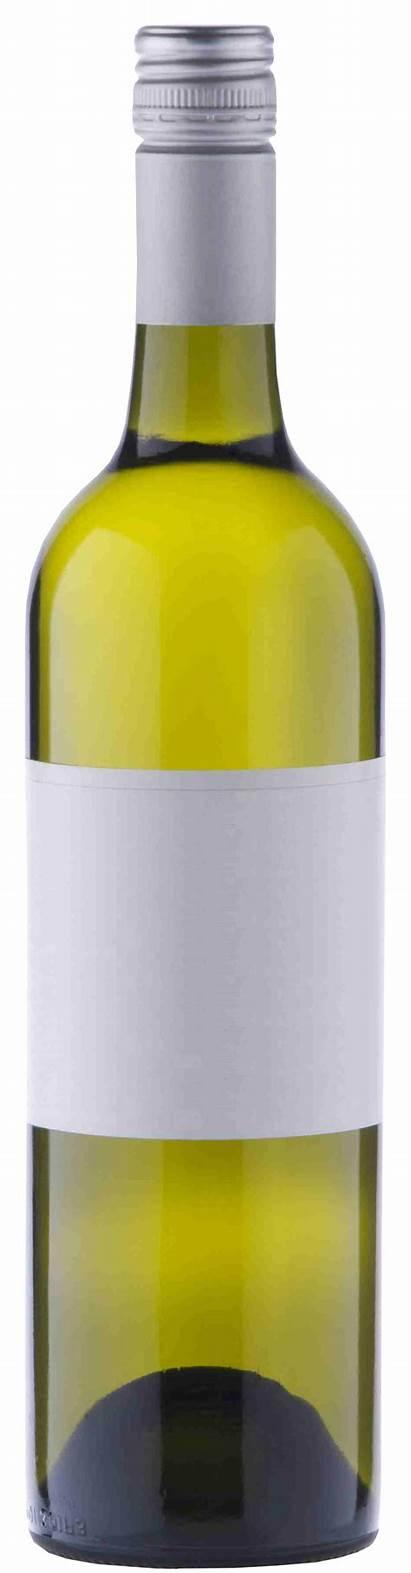 Bottle Wine Decanter Bordeaux Beer Blanc France